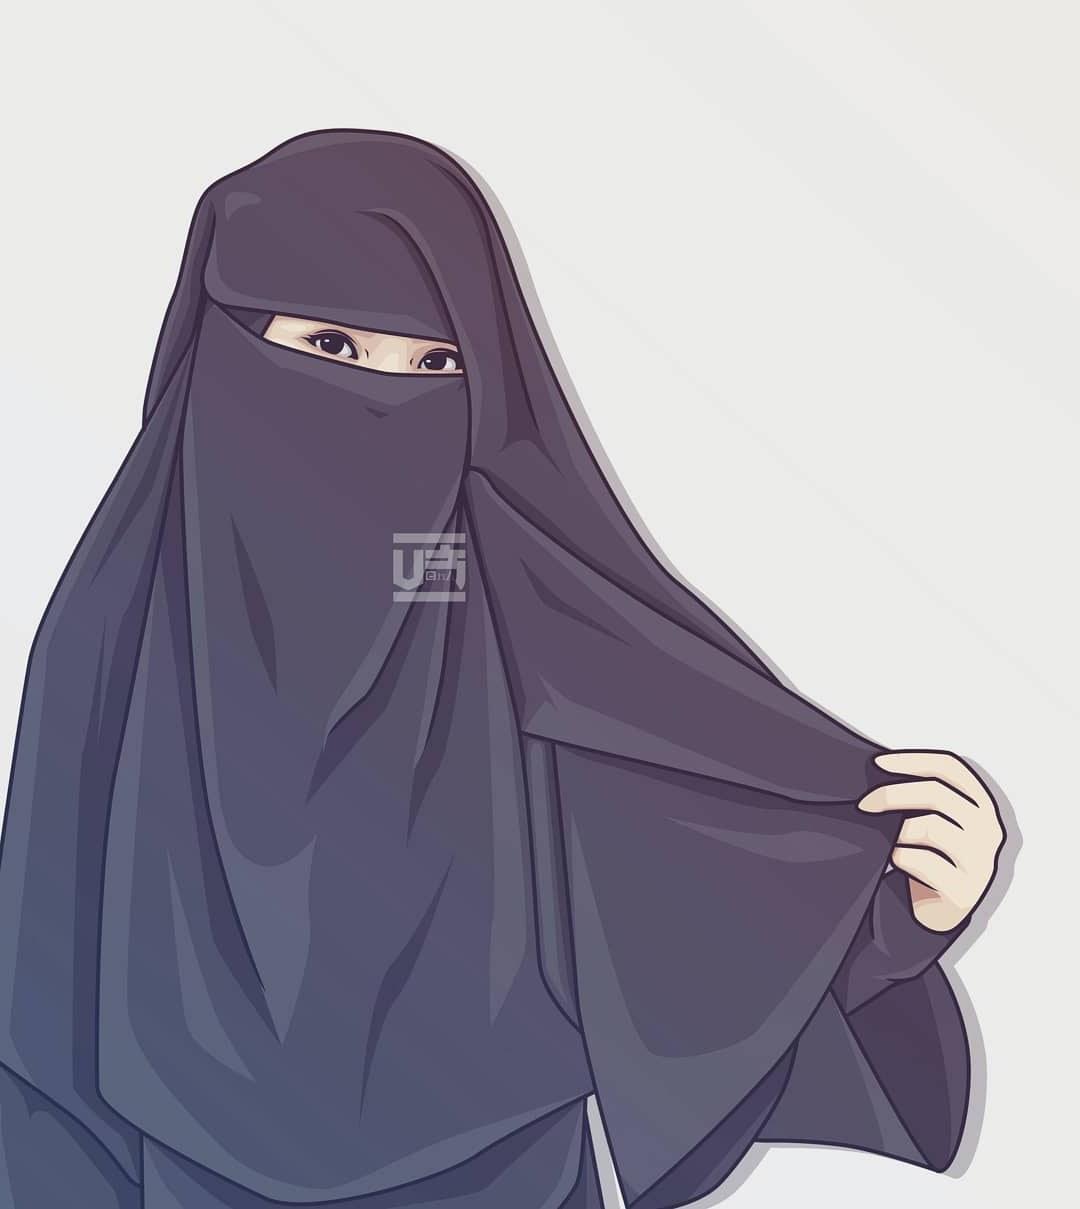 Design Muslimah Bercadar Cantik Kartun Ipdd Menakjubkan 30 Gambar Kartun Muslimah Bercadar Berkacamata